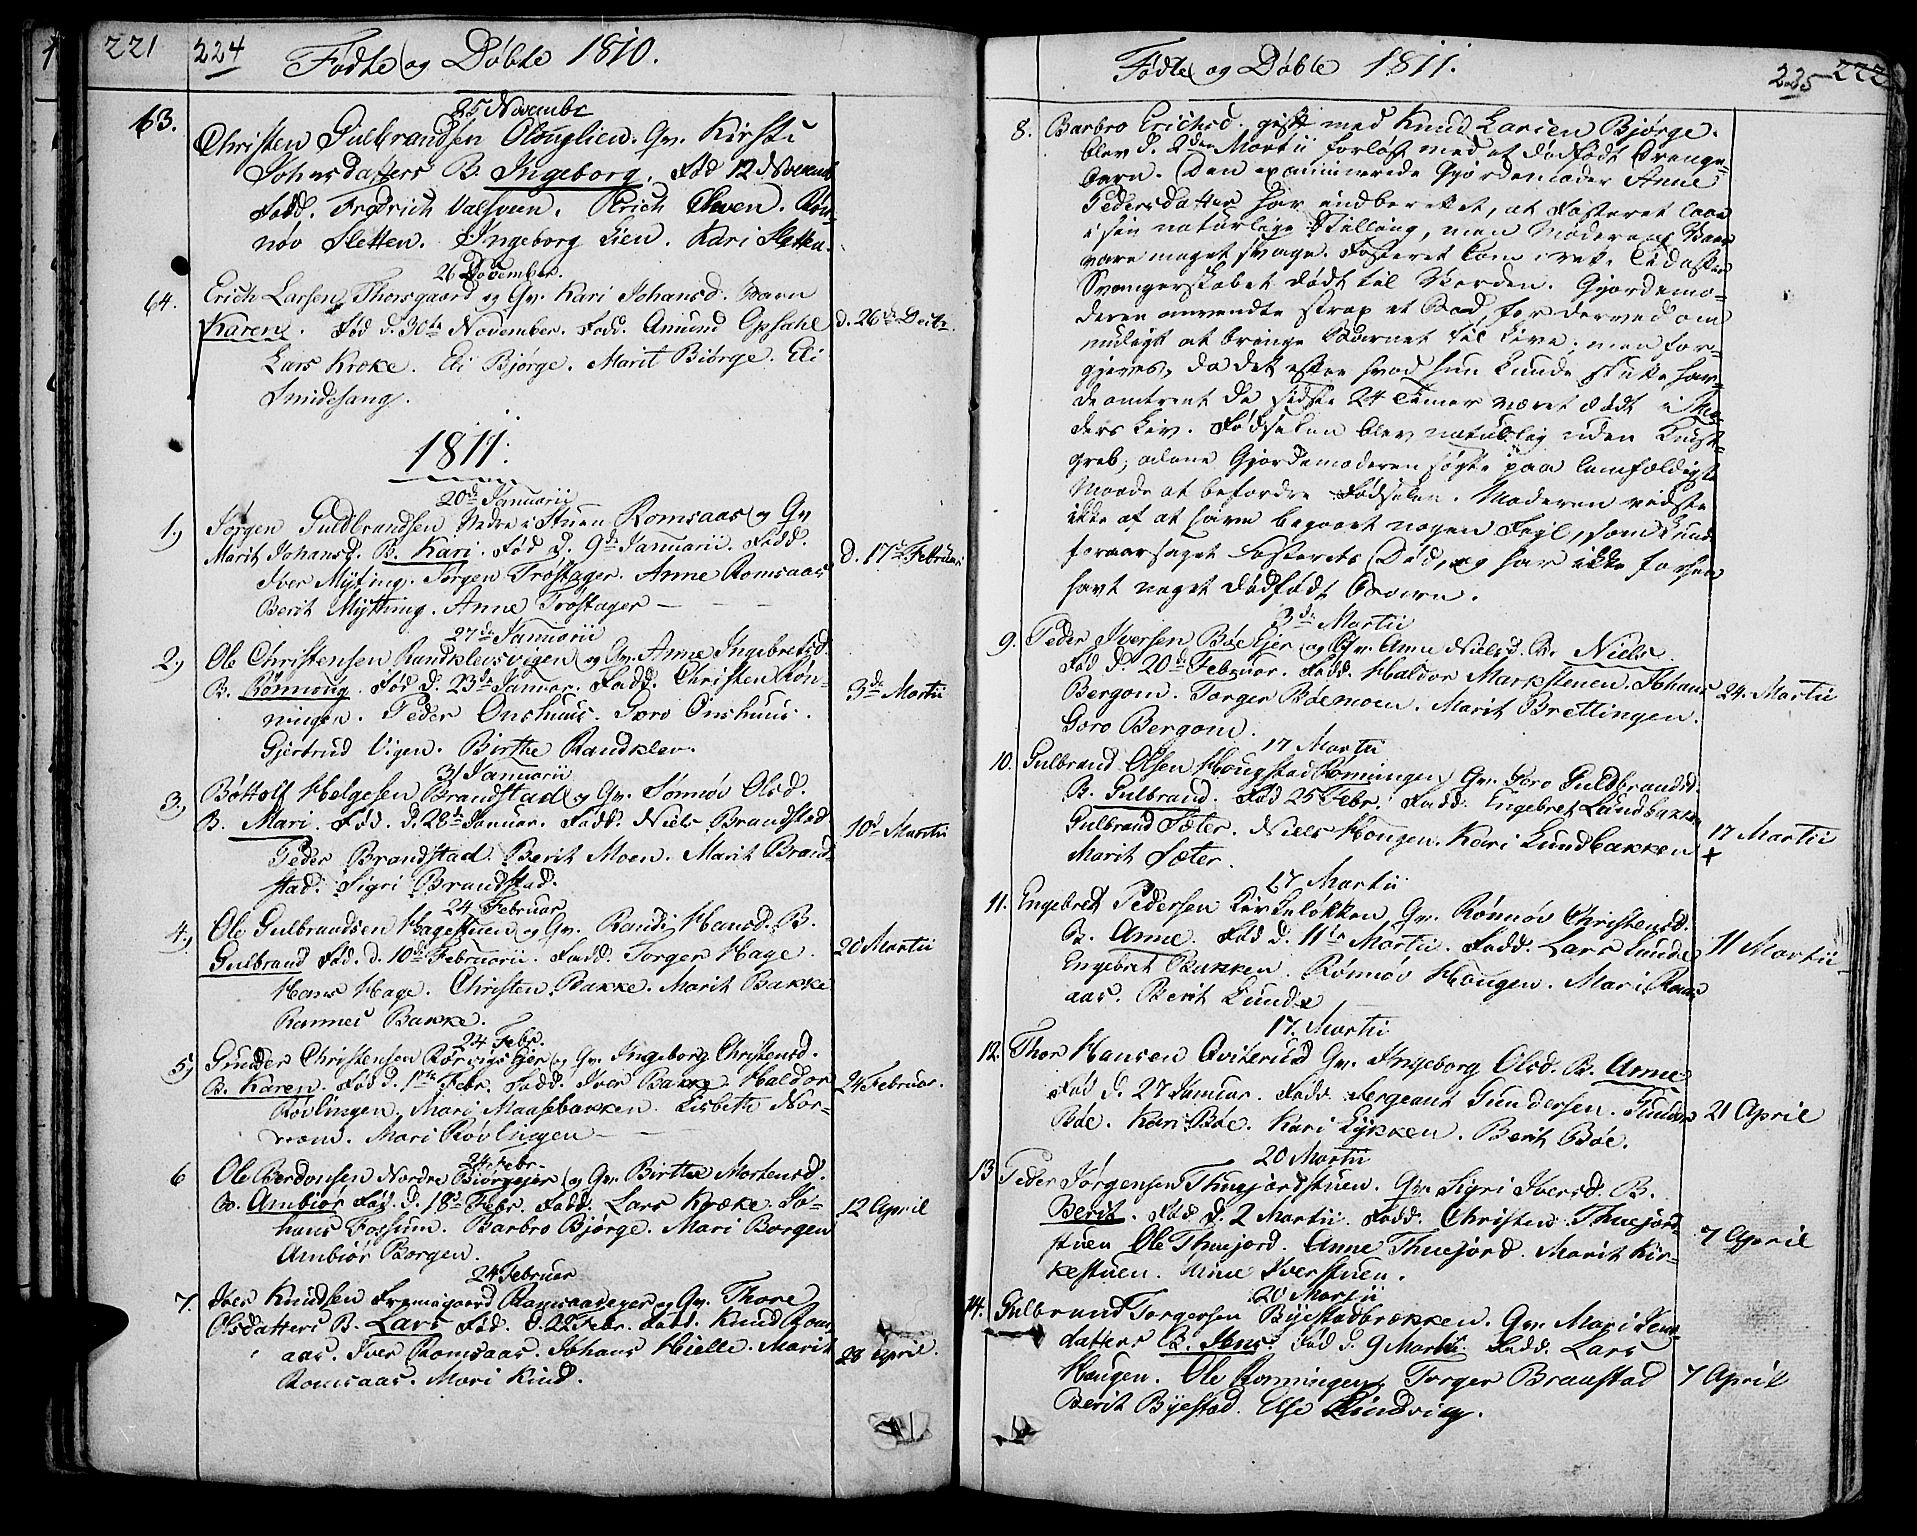 SAH, Ringebu prestekontor, Ministerialbok nr. 3, 1781-1820, s. 224-225